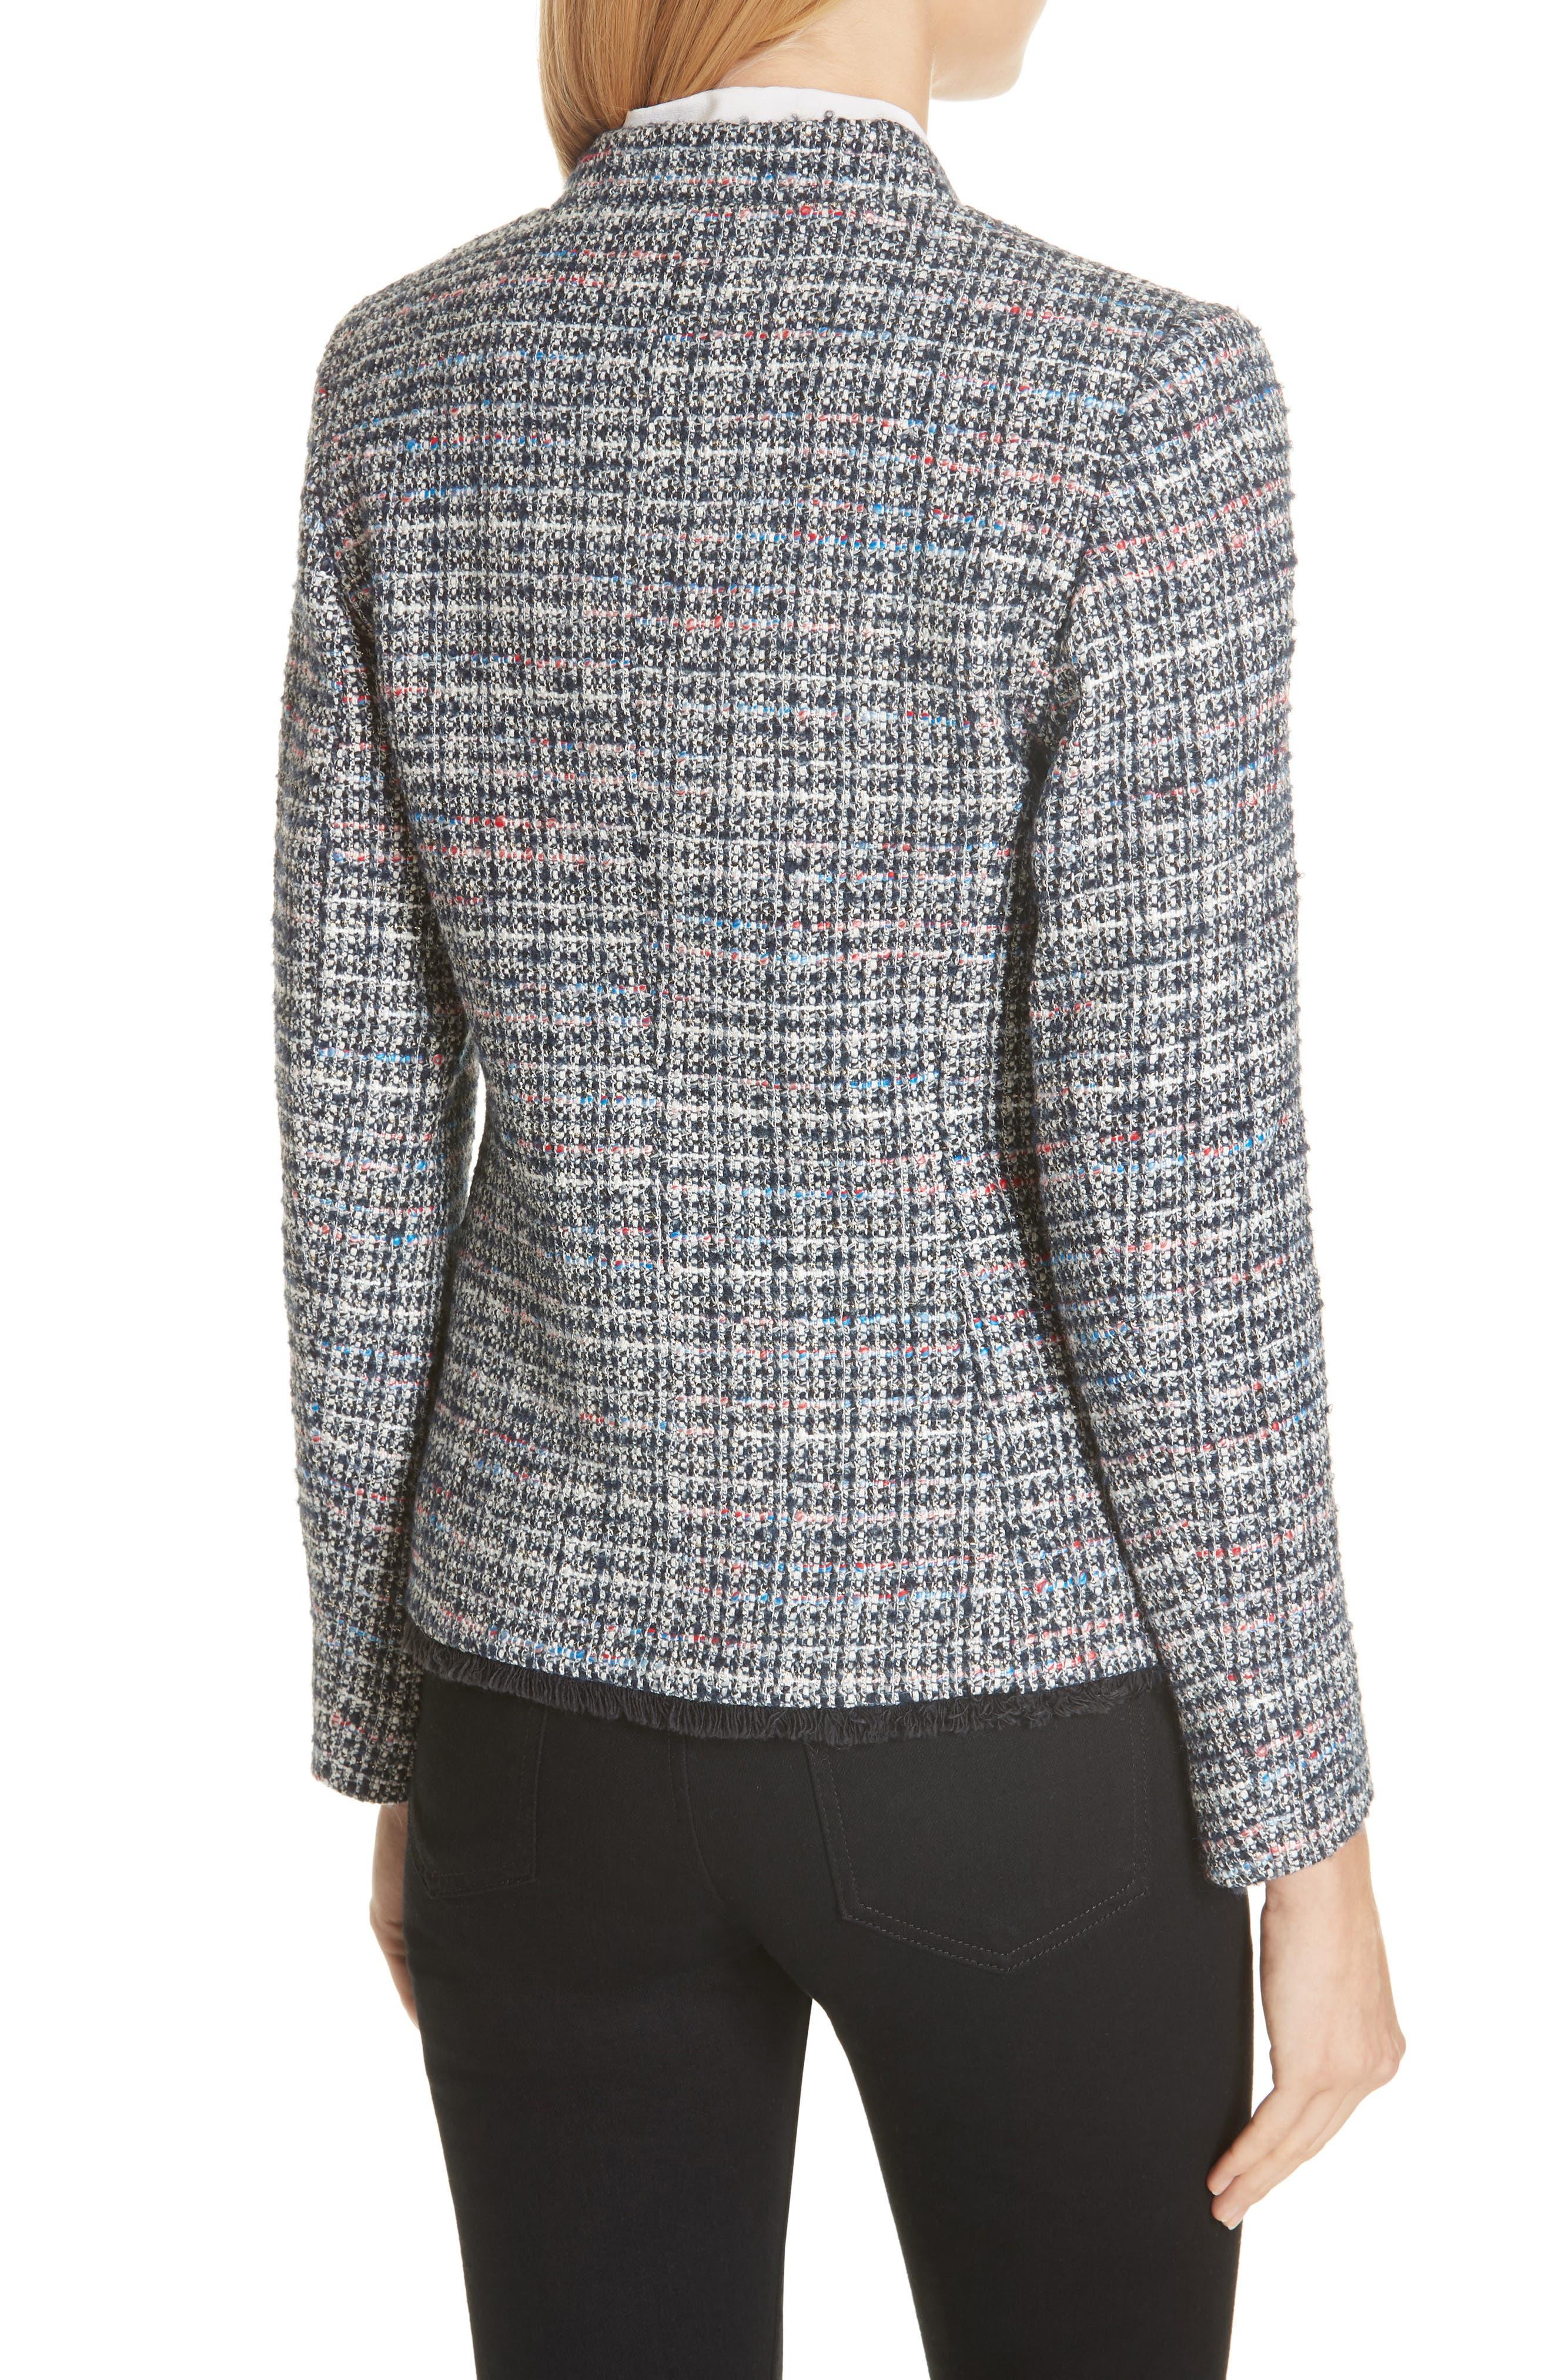 Notch Collar Tweed Jacket,                             Alternate thumbnail 2, color,                             400